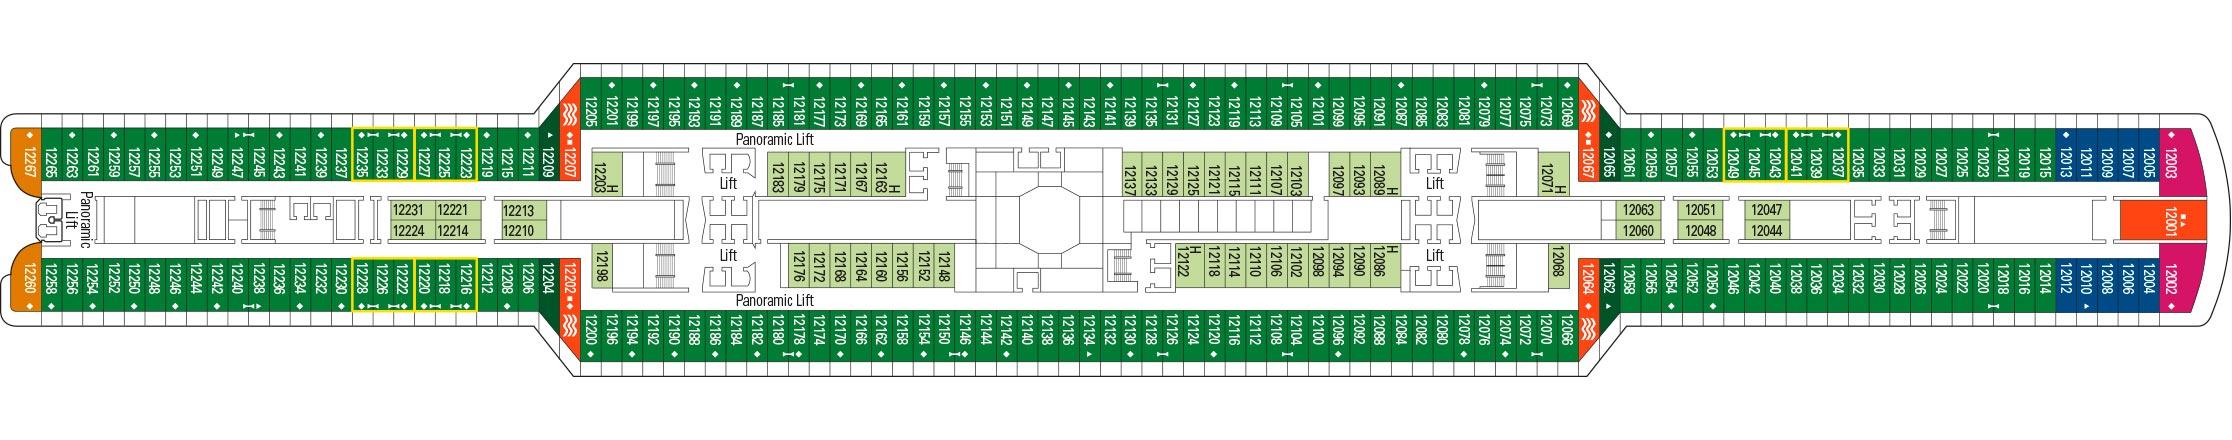 MSC Cruises MSC Seaview Deckplans Deck 12.jpg